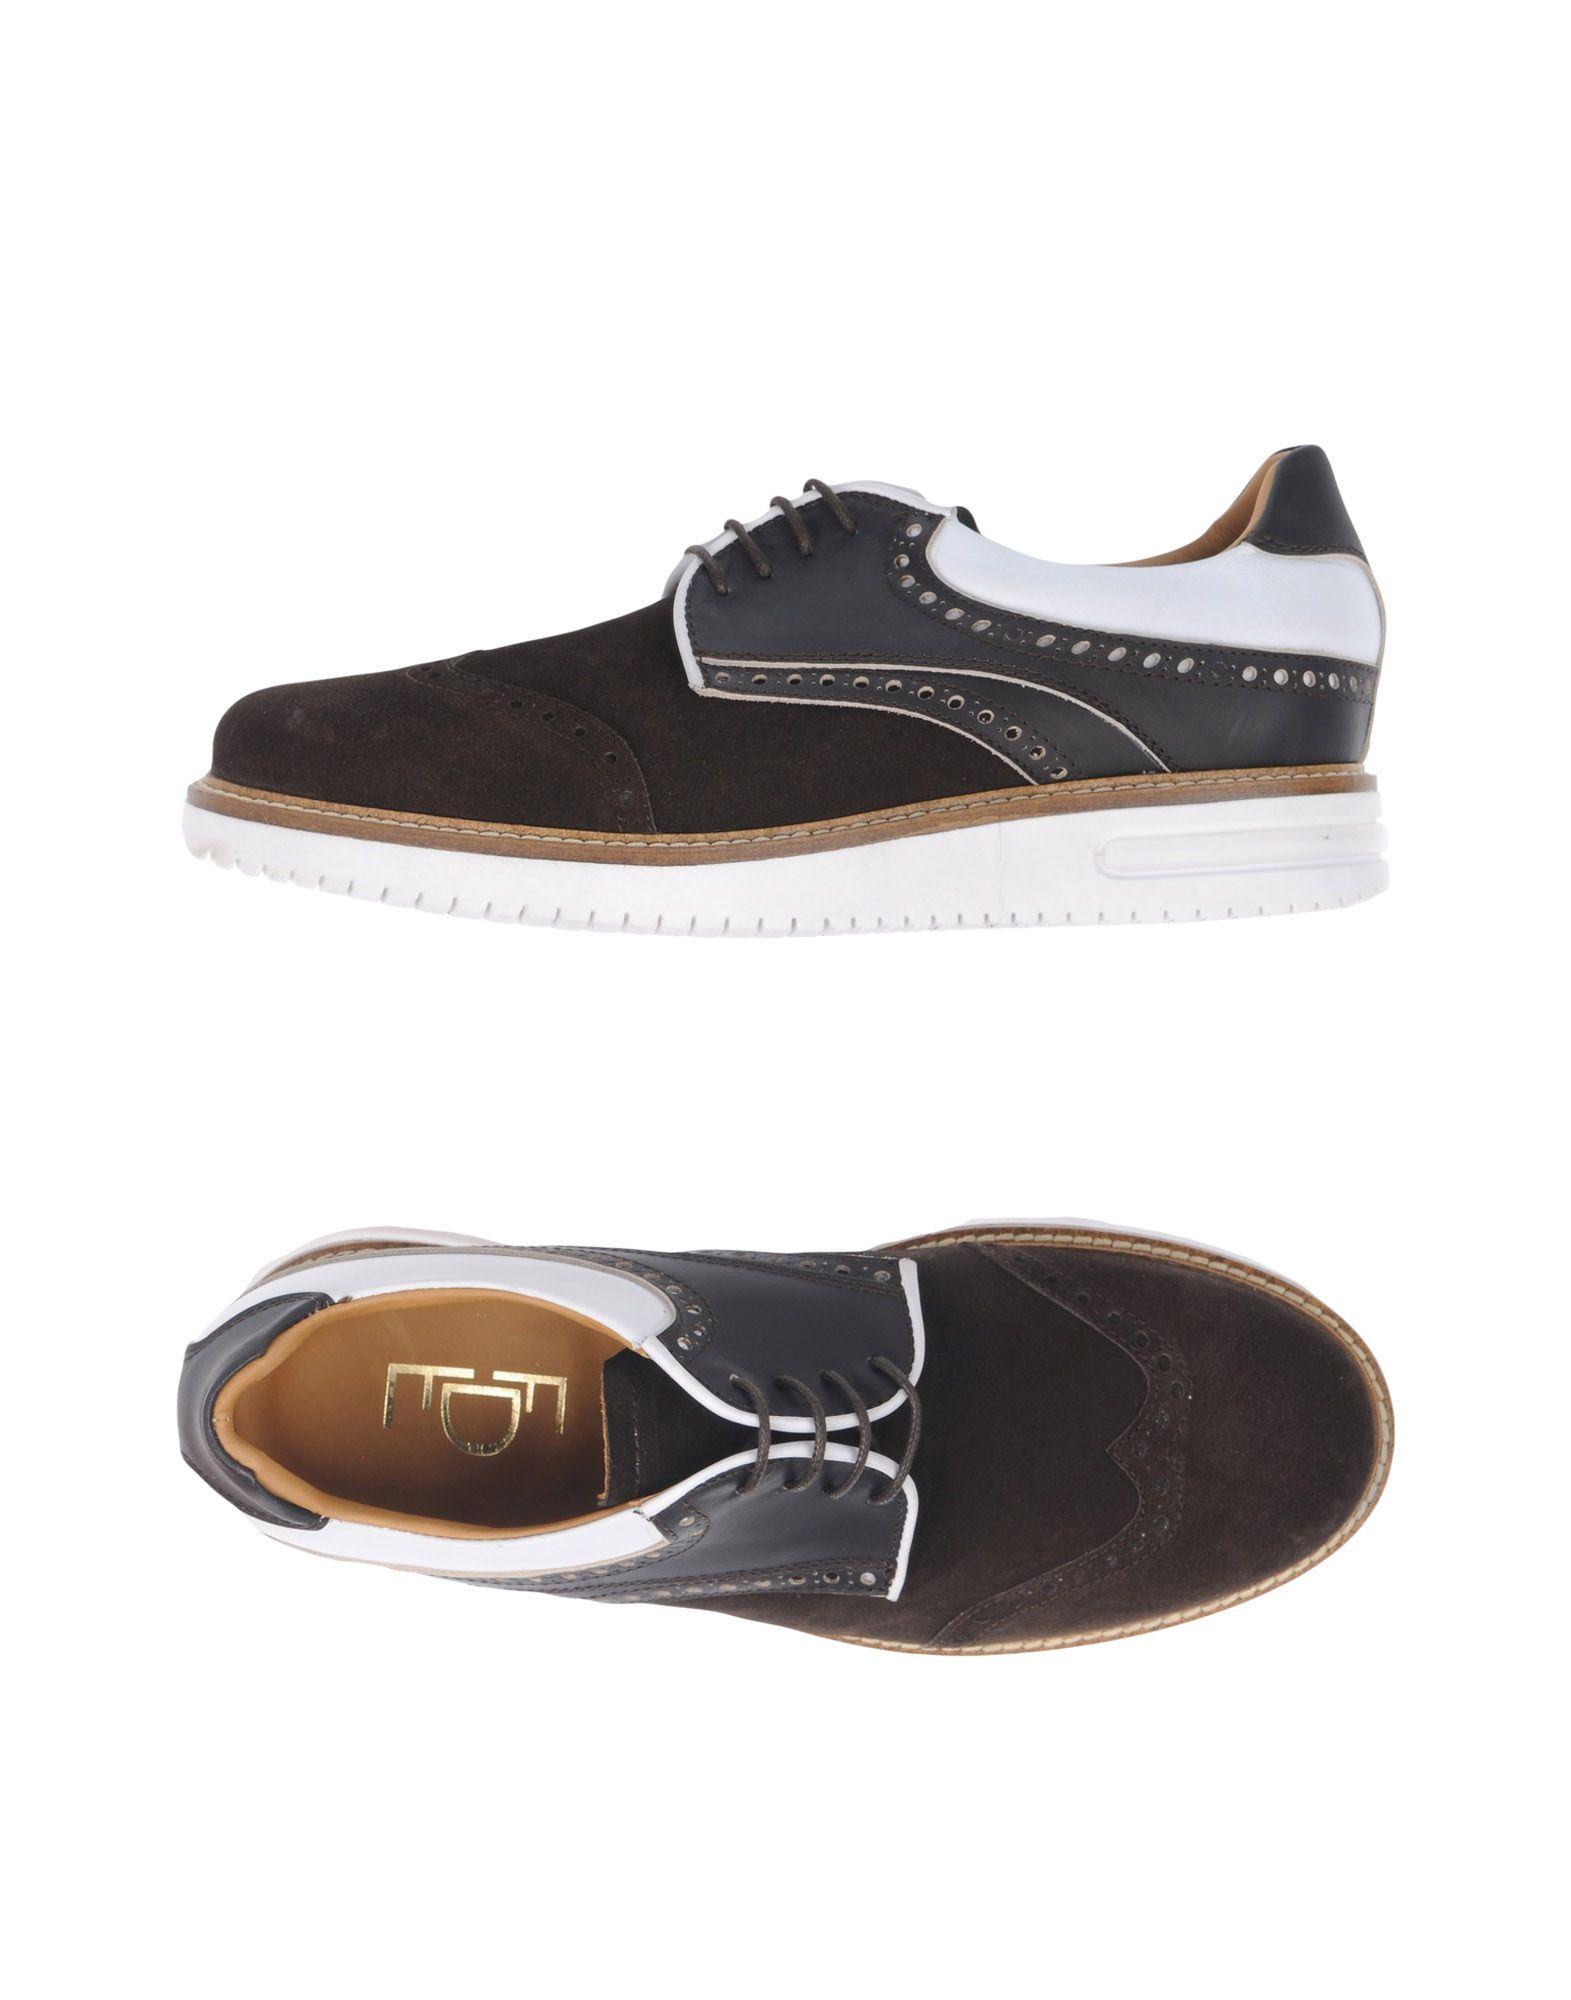 Rabatt echte Schuhe Fdf Shoes Schnürschuhe Herren  11342996TX